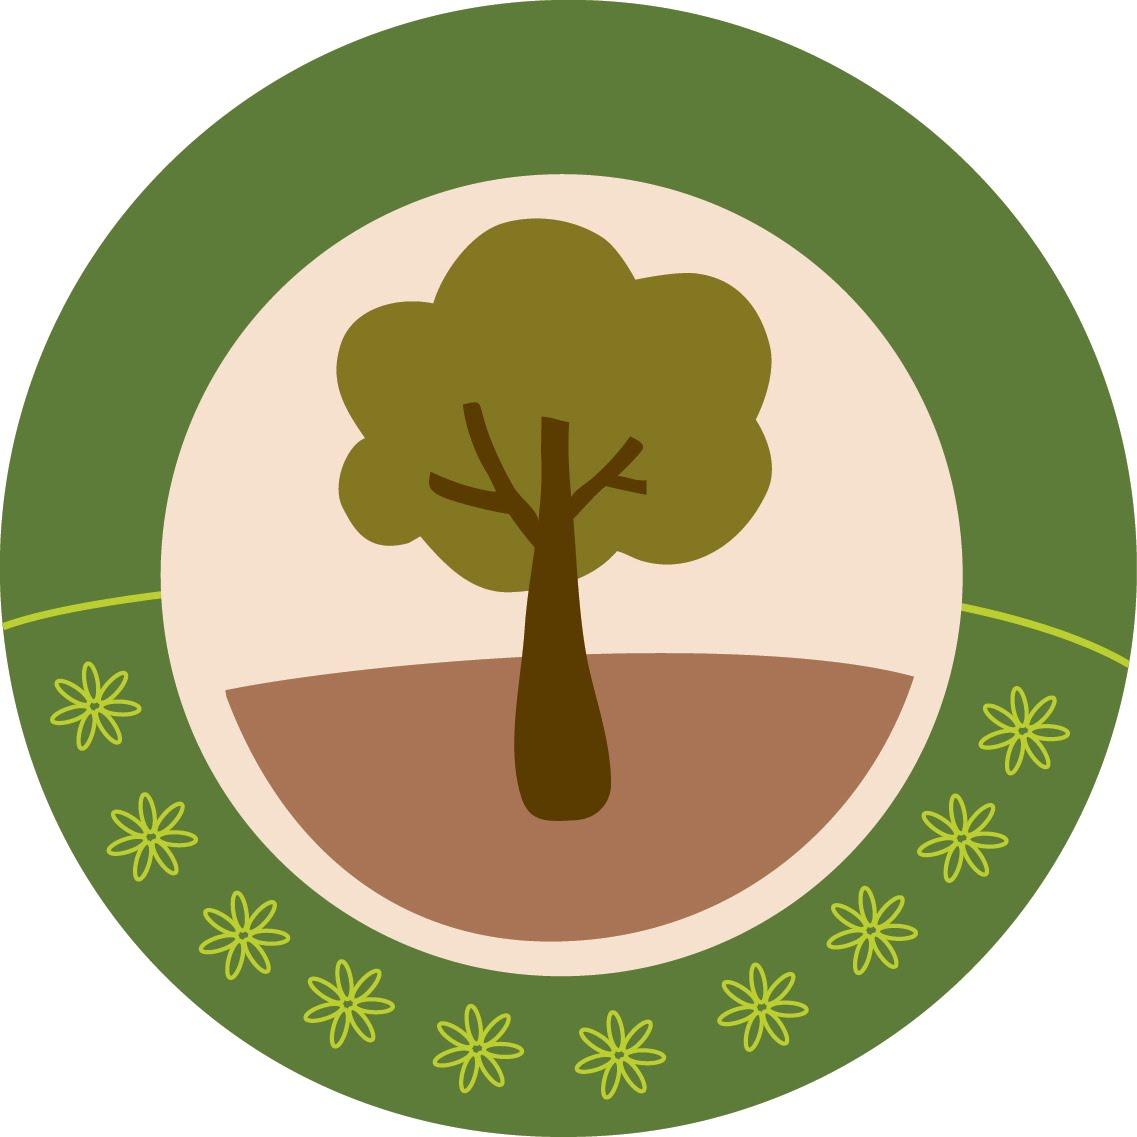 http://eko-skolky.cz/_files/userfiles/temata/piktogramy_temata_strom.jpg